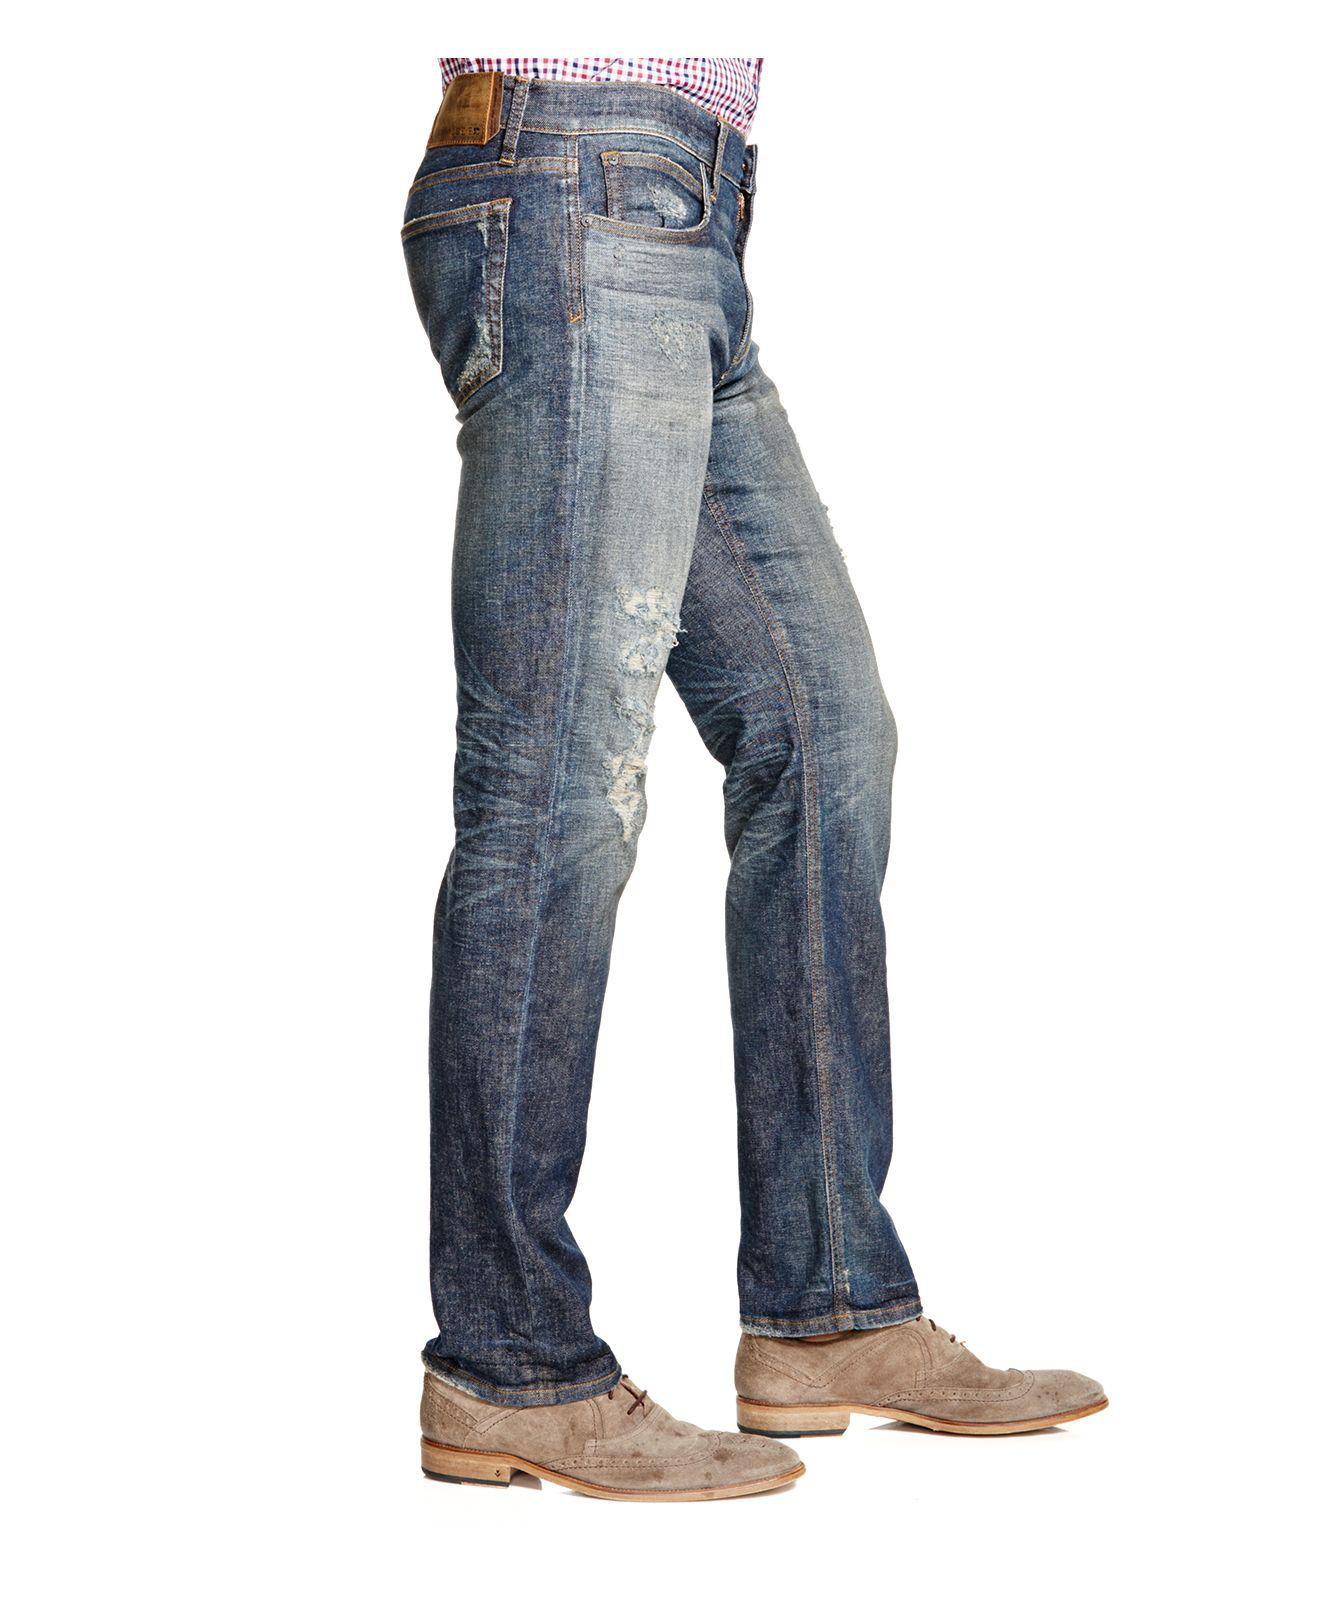 Joe's Jeans Brixton Straight Fit In Jessie in Blue